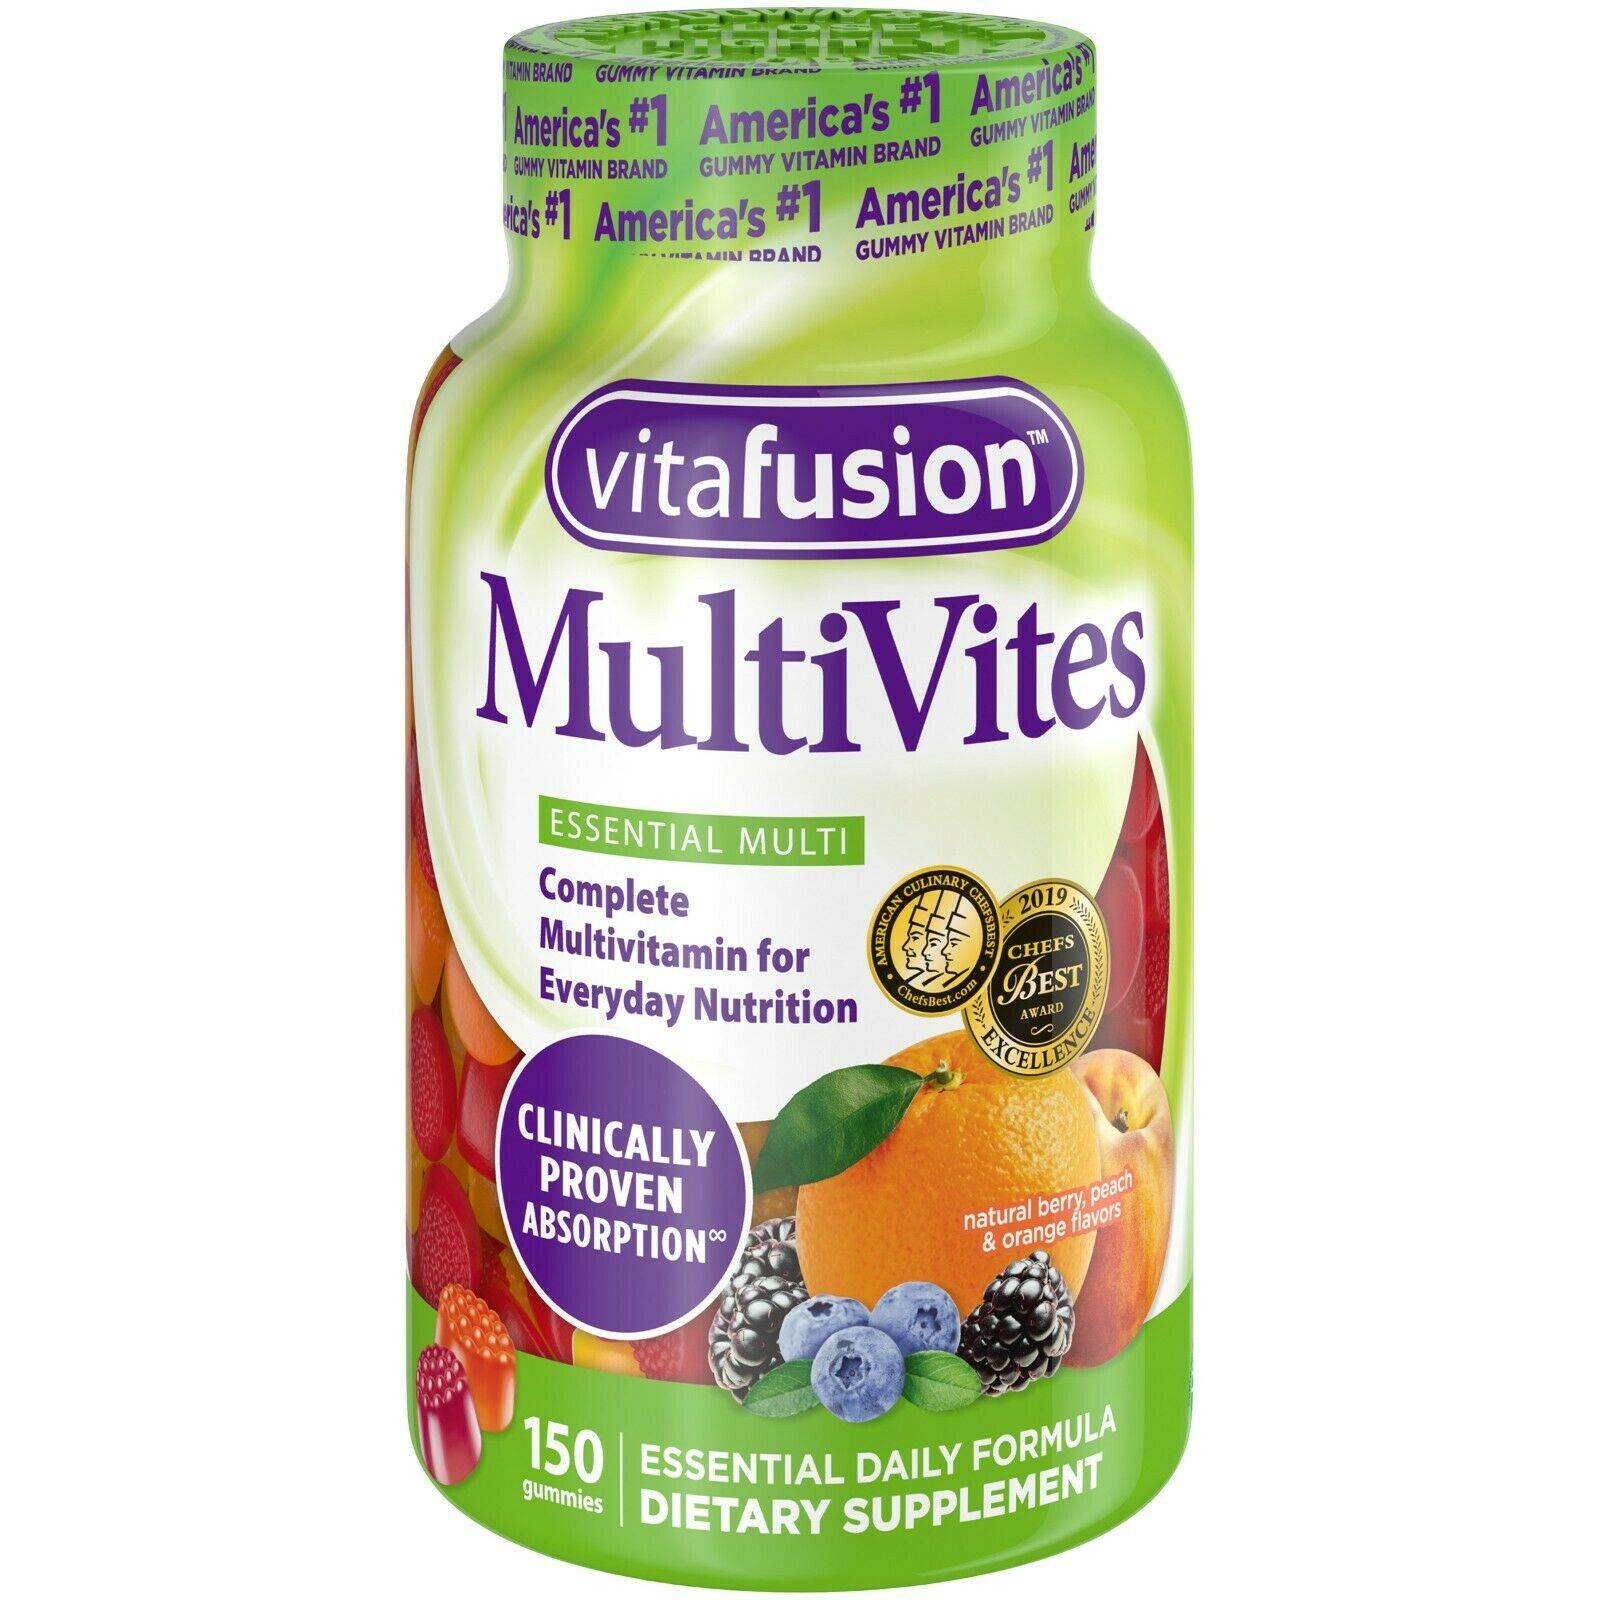 Vitafusion MultiVites Gummy Vitamins, 150 count